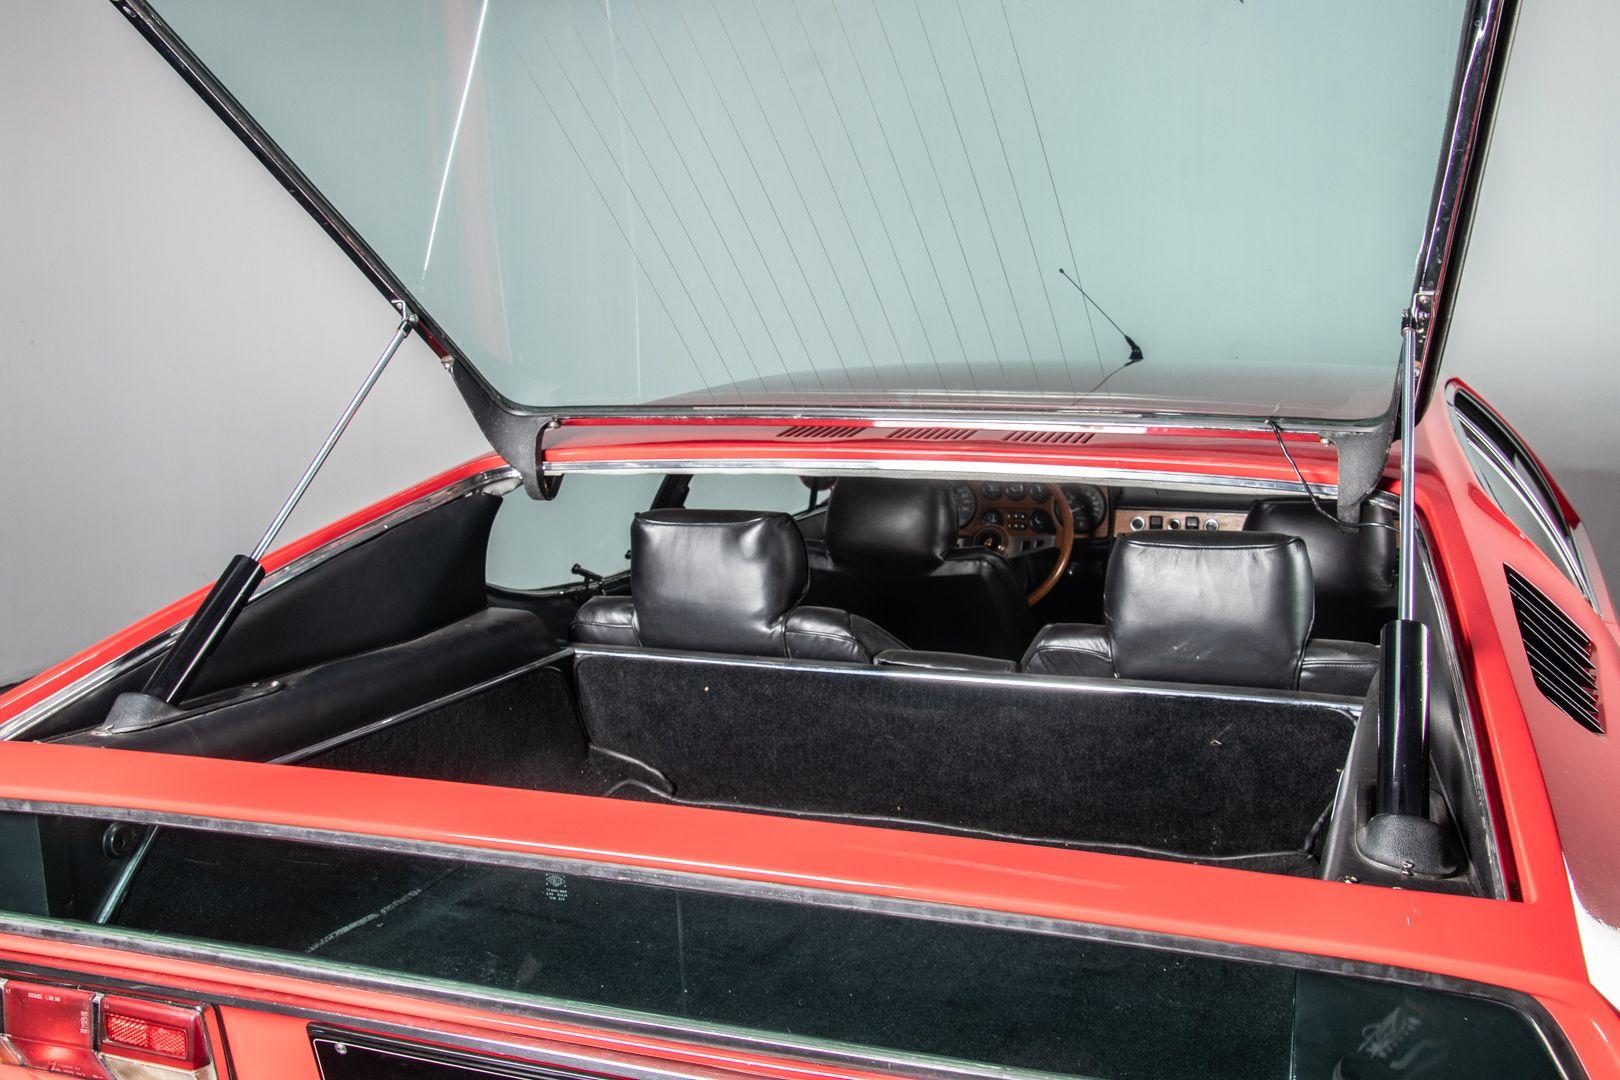 1970 Lamborghini Espada II° Serie 22698